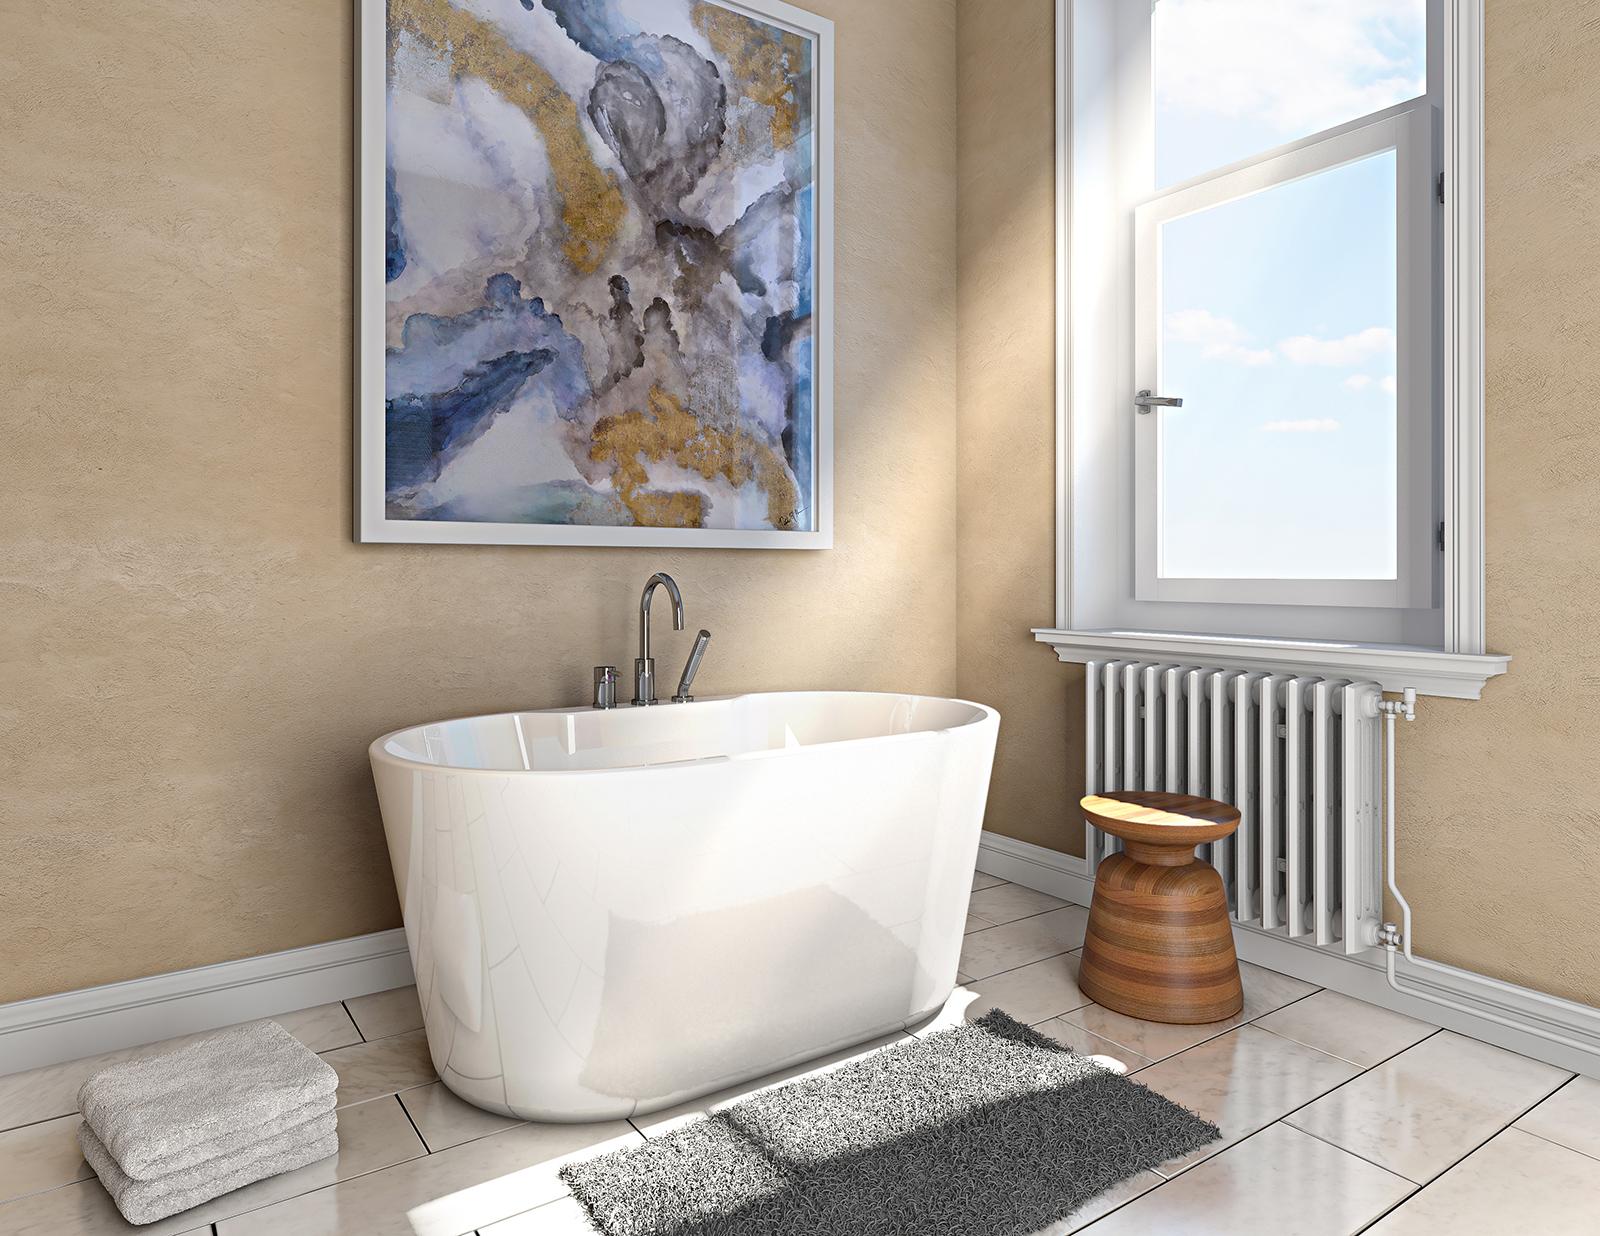 bain douche salle de bain bath shower 3d